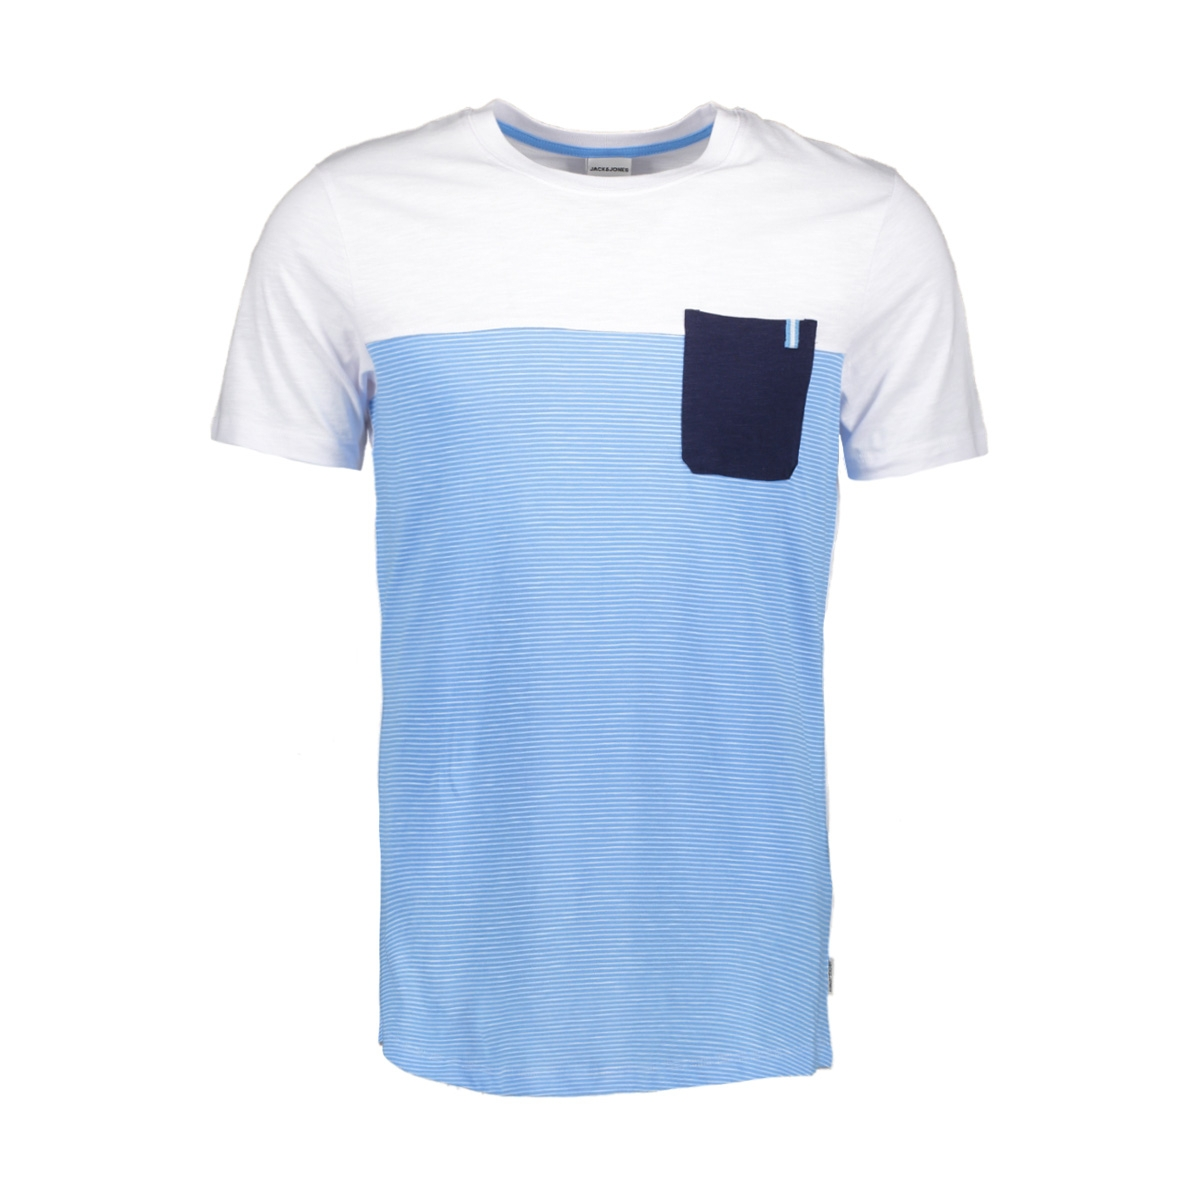 jcosect tee ss crew neck 12152159 jack & jones t-shirt white